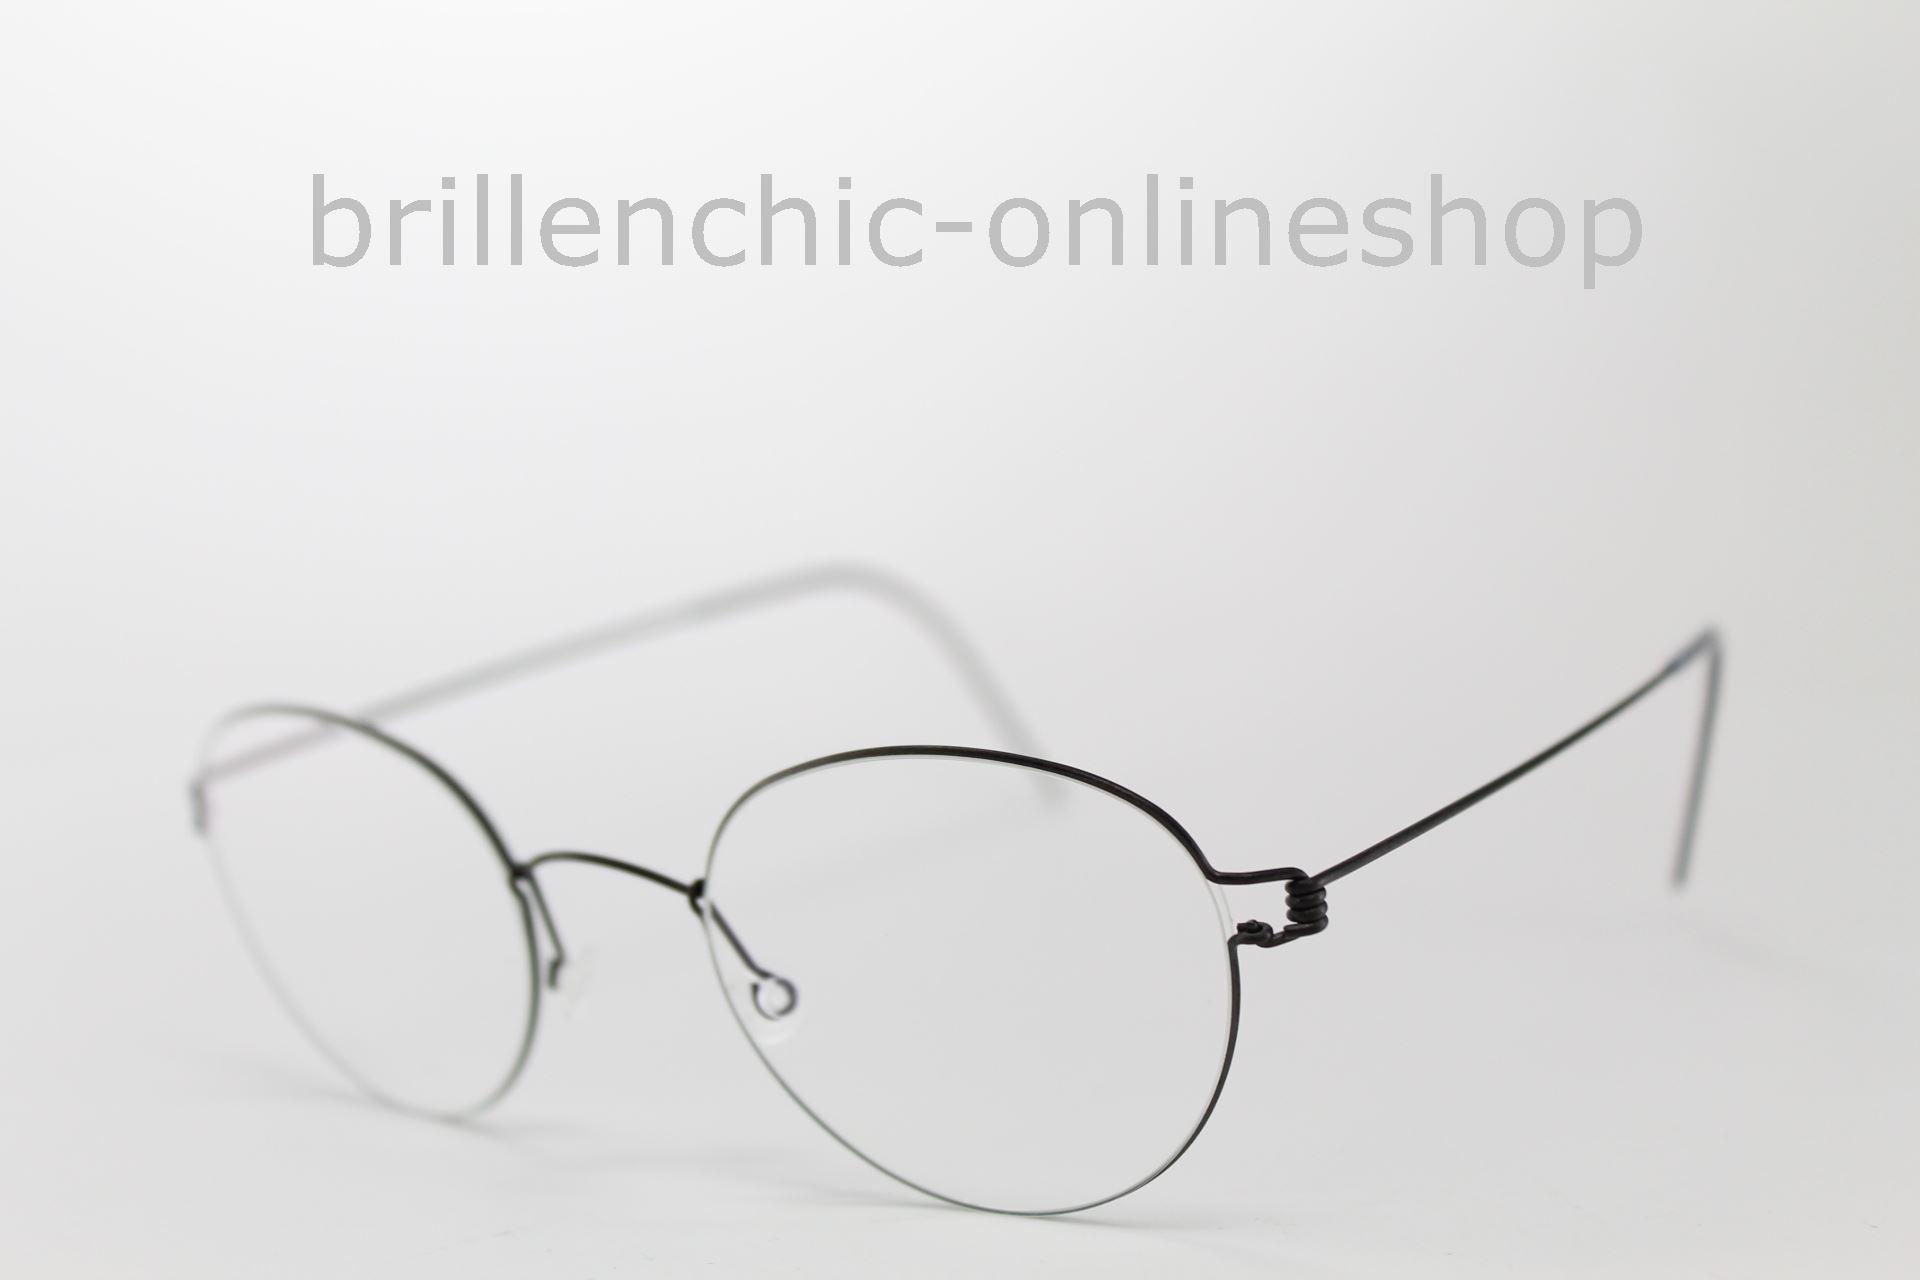 Brillenchic-onlineshop in Berlin - LINDBERG Rim Titanium BO U9 \